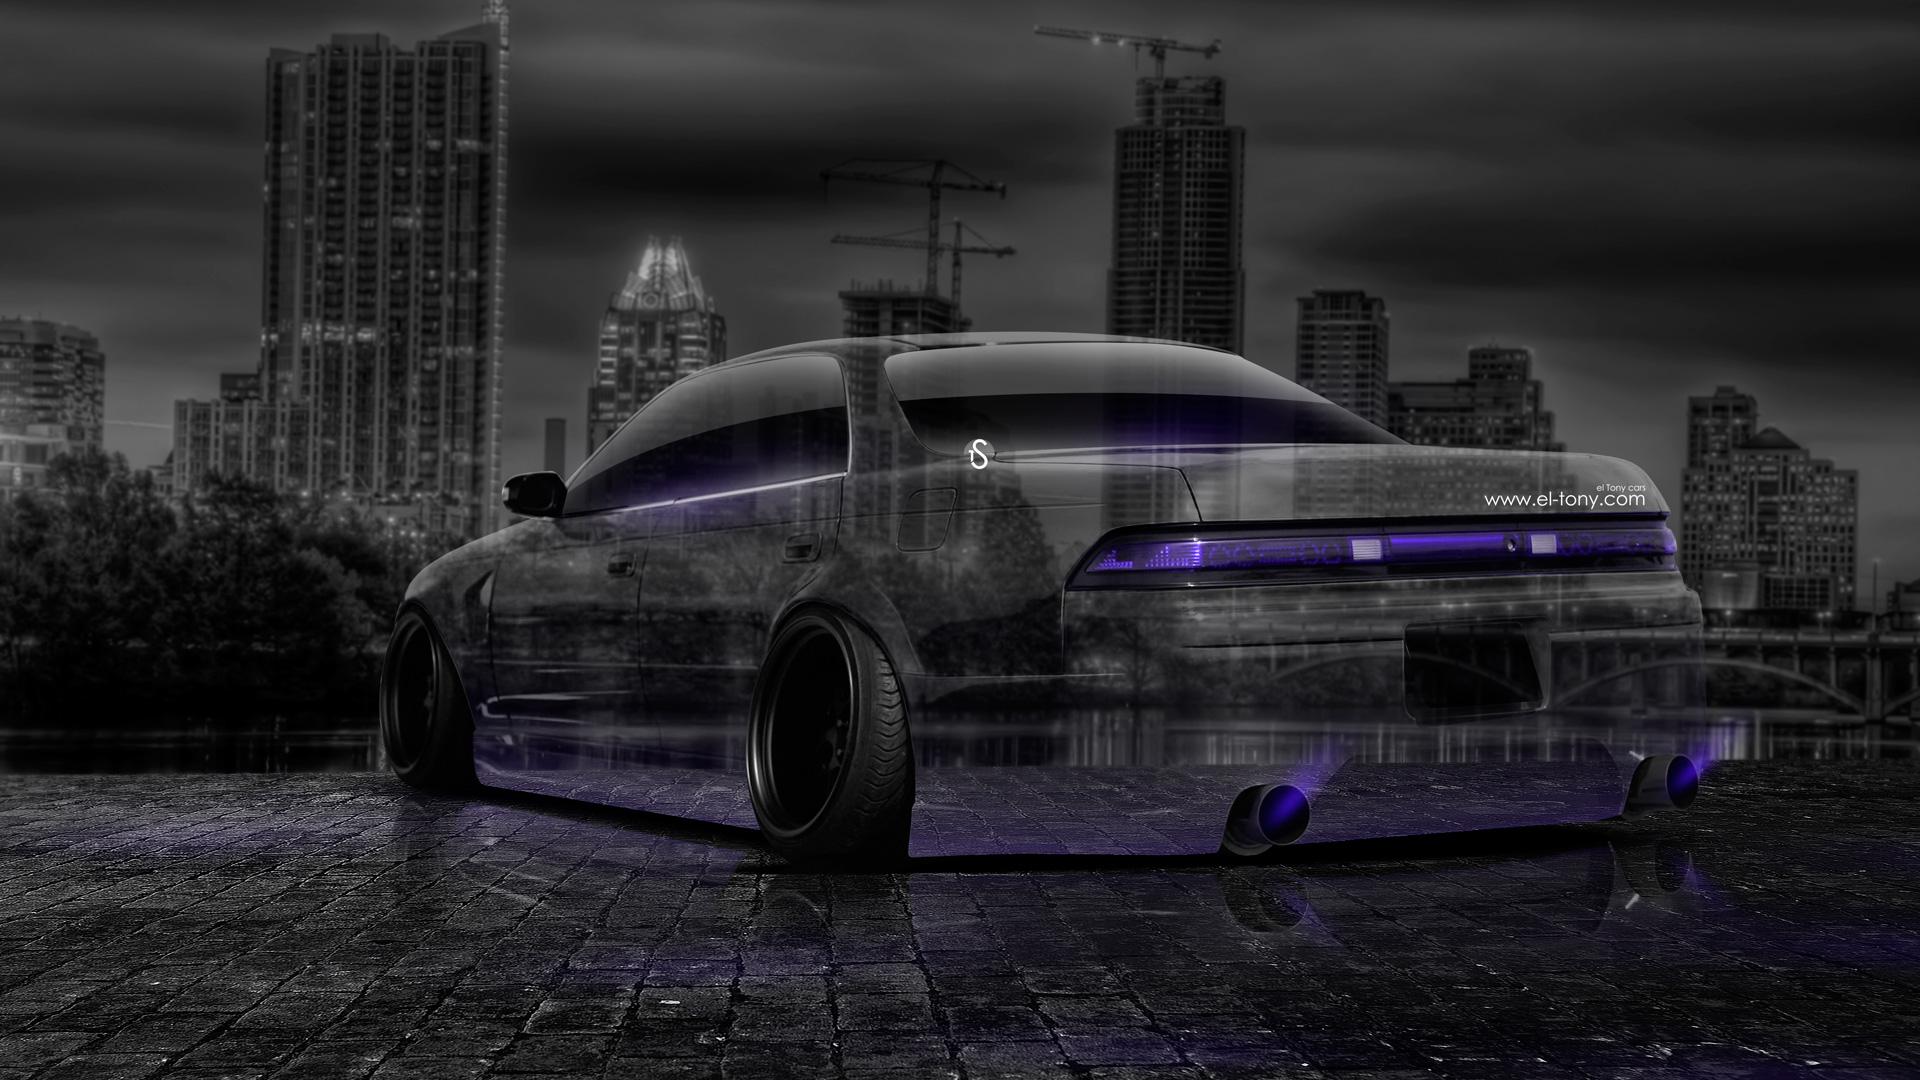 Toyota Mark2 JZX90 JDM Crystal City Car 2014 Violet Neon HD ...